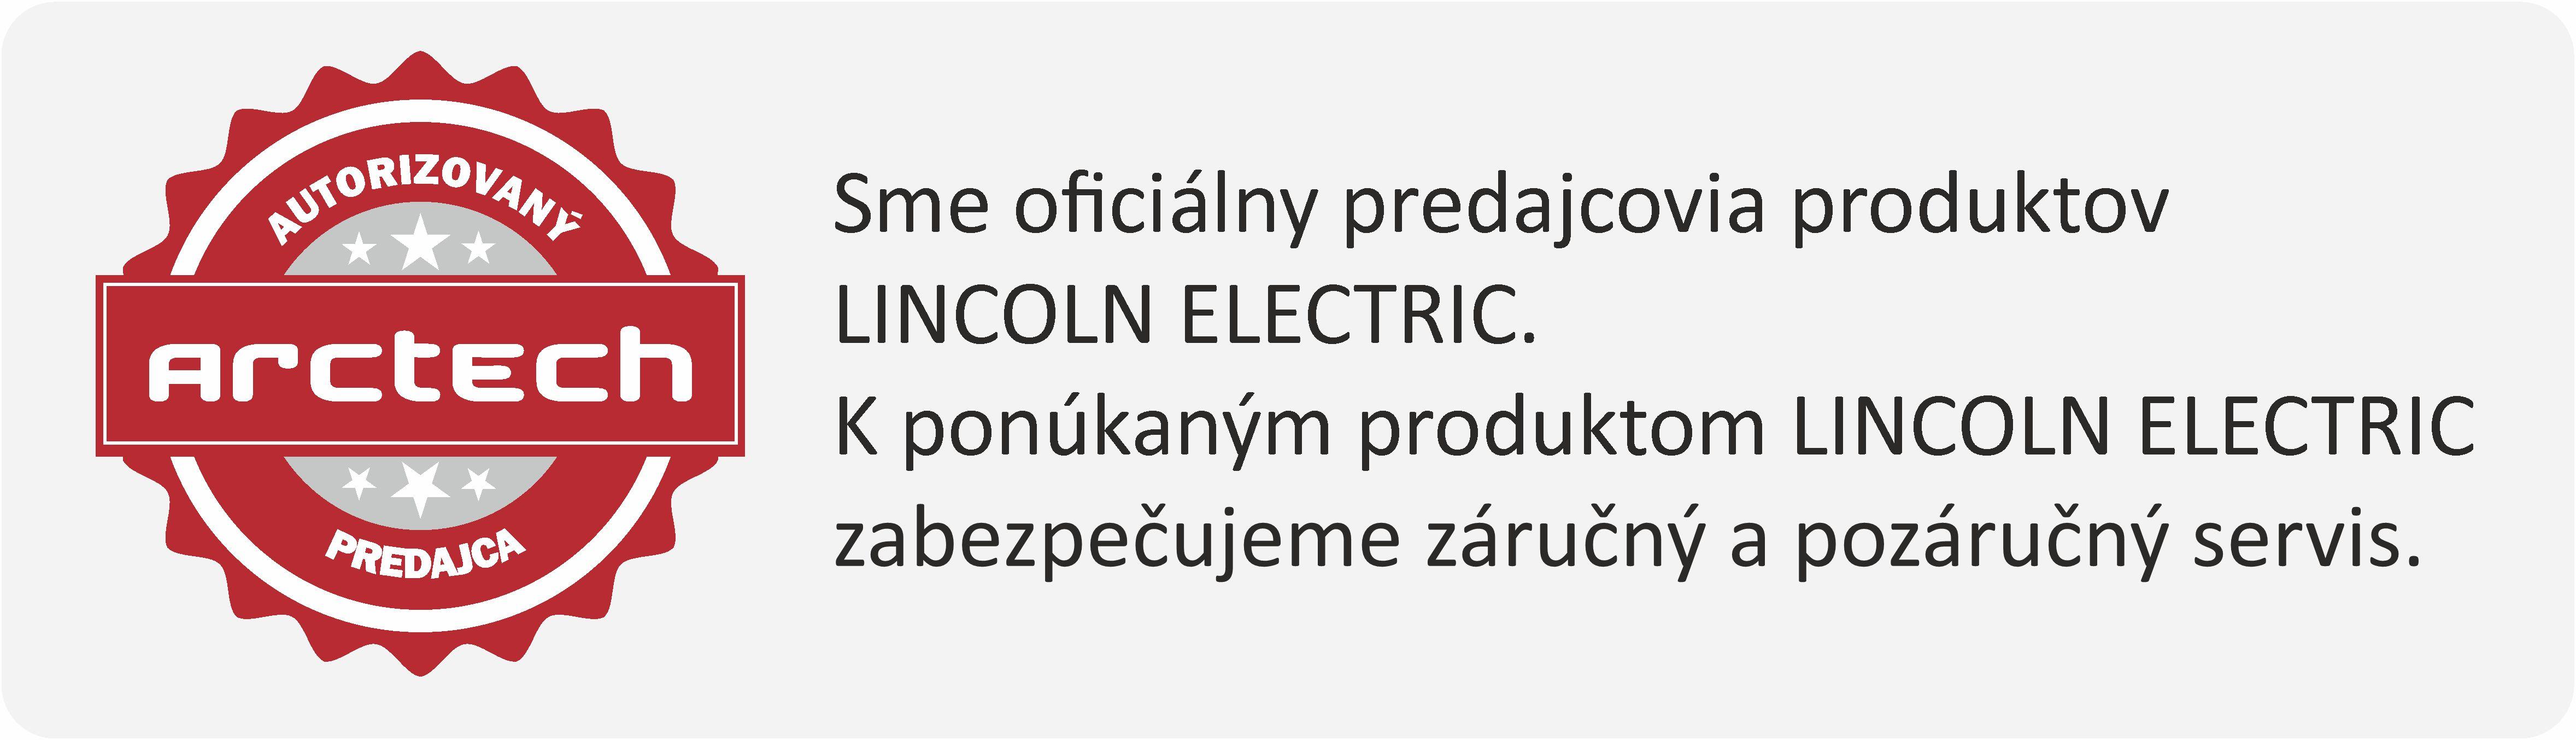 Lincoln Electric autorizovaný predajca